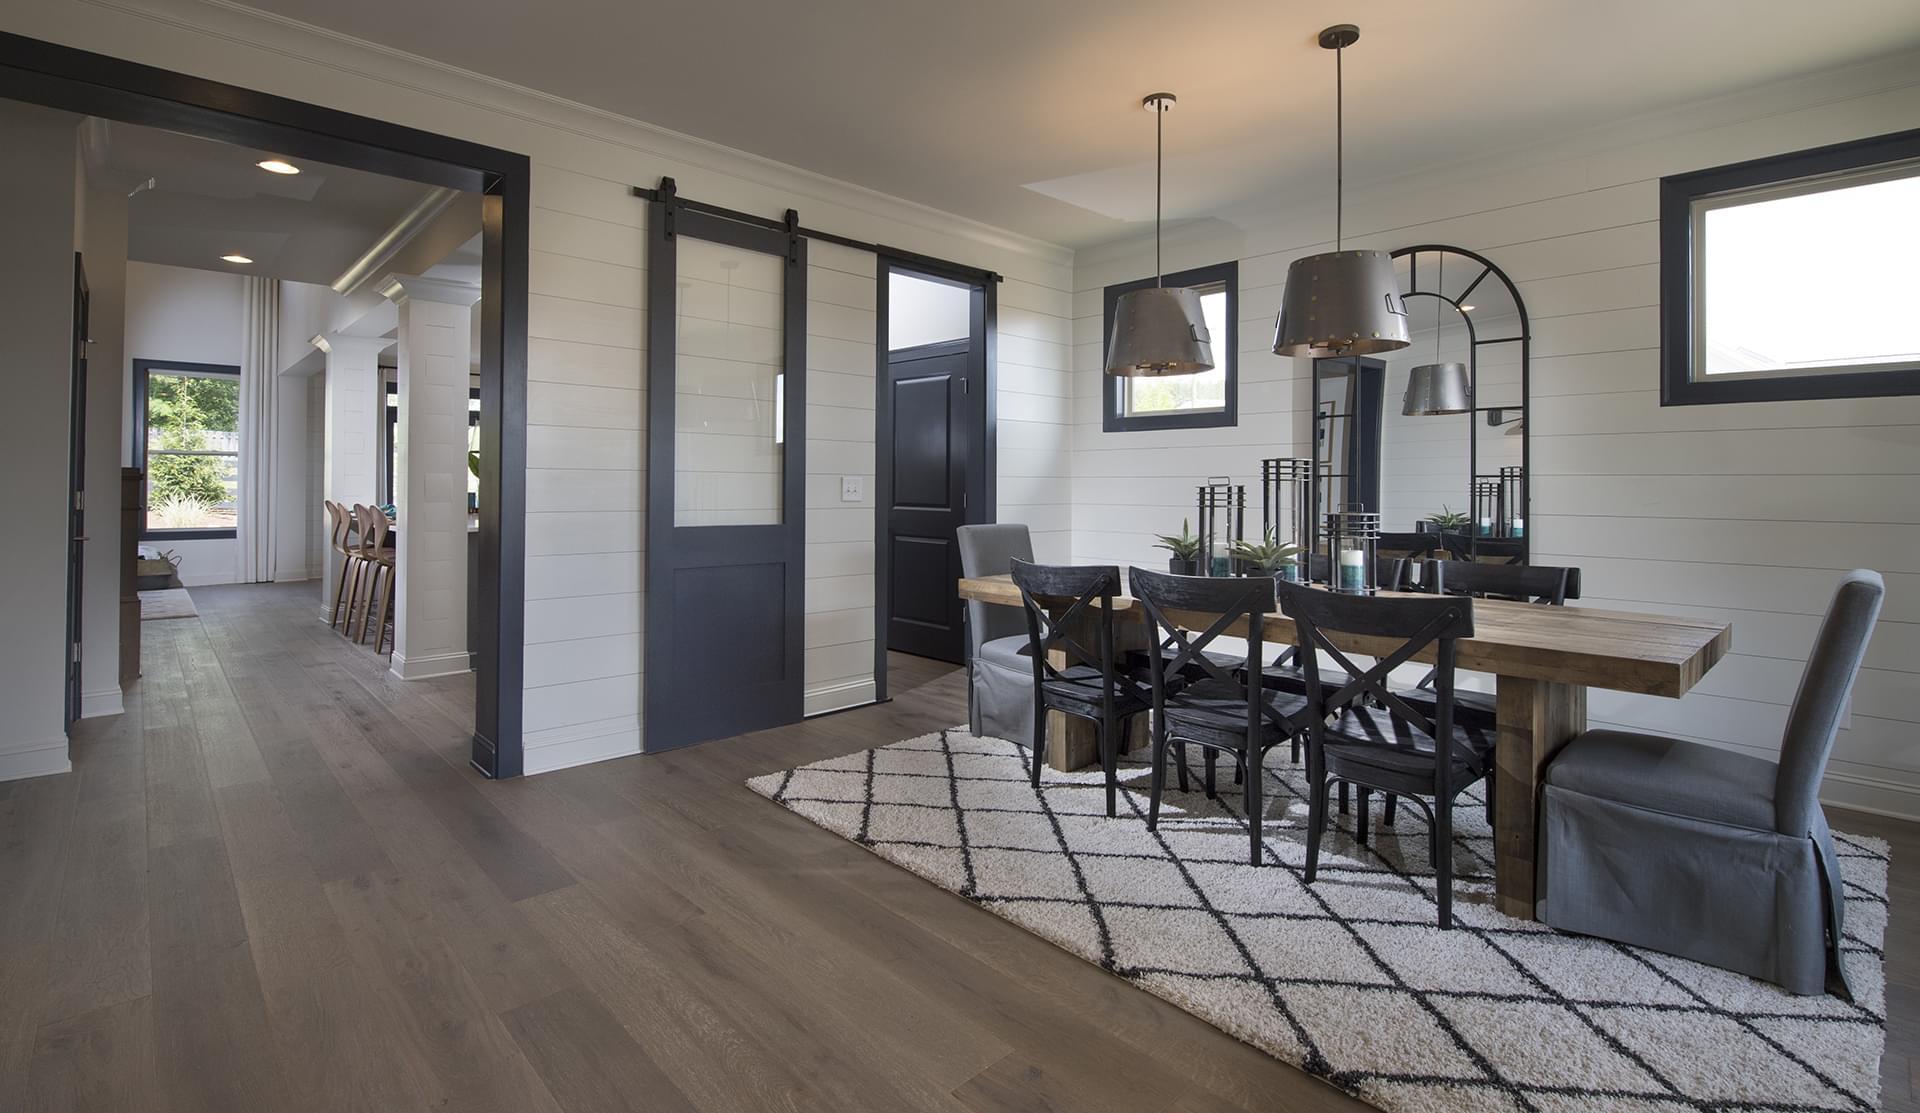 The Calhoun New Home in Suwanee GA